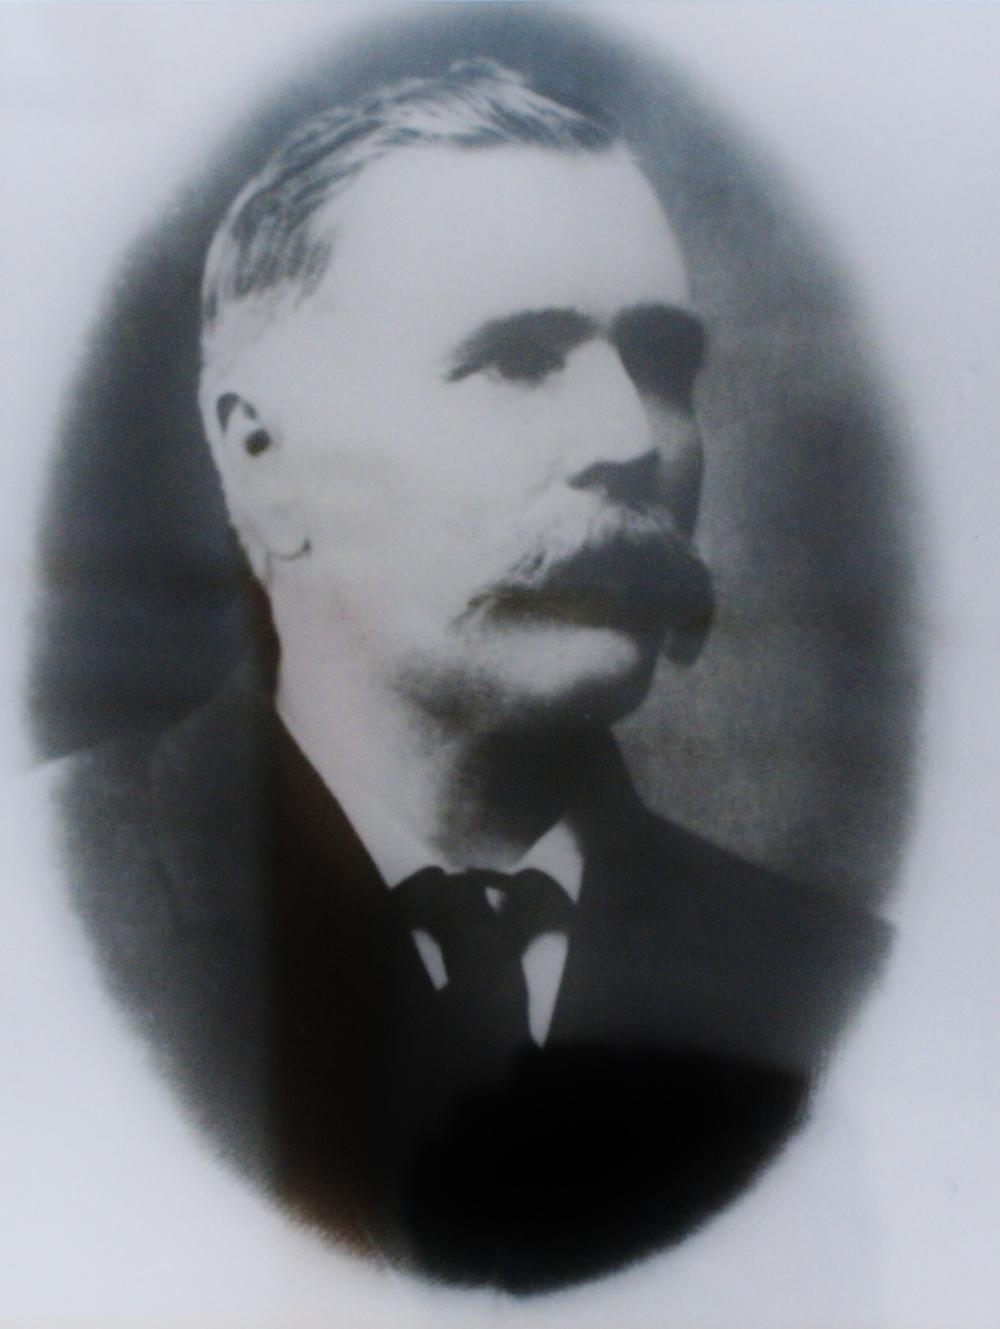 J.W. Pearce 1901